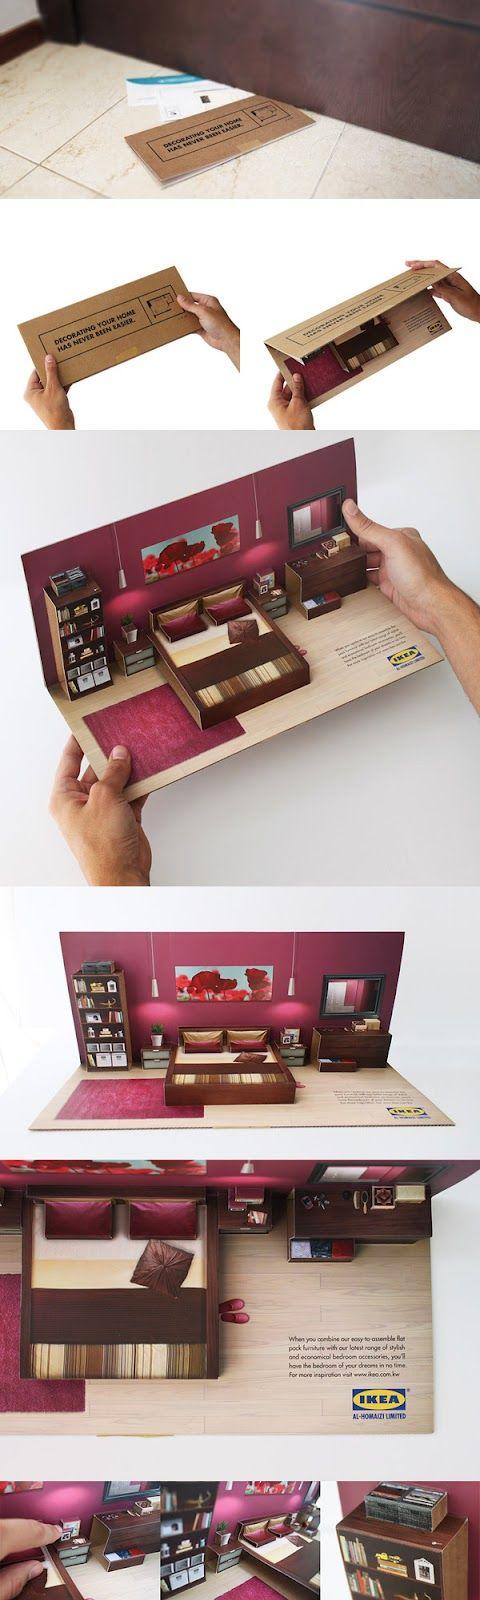 Viralmente: Ikea Flat Pack Direct Mailer by Leo Rosa Borges